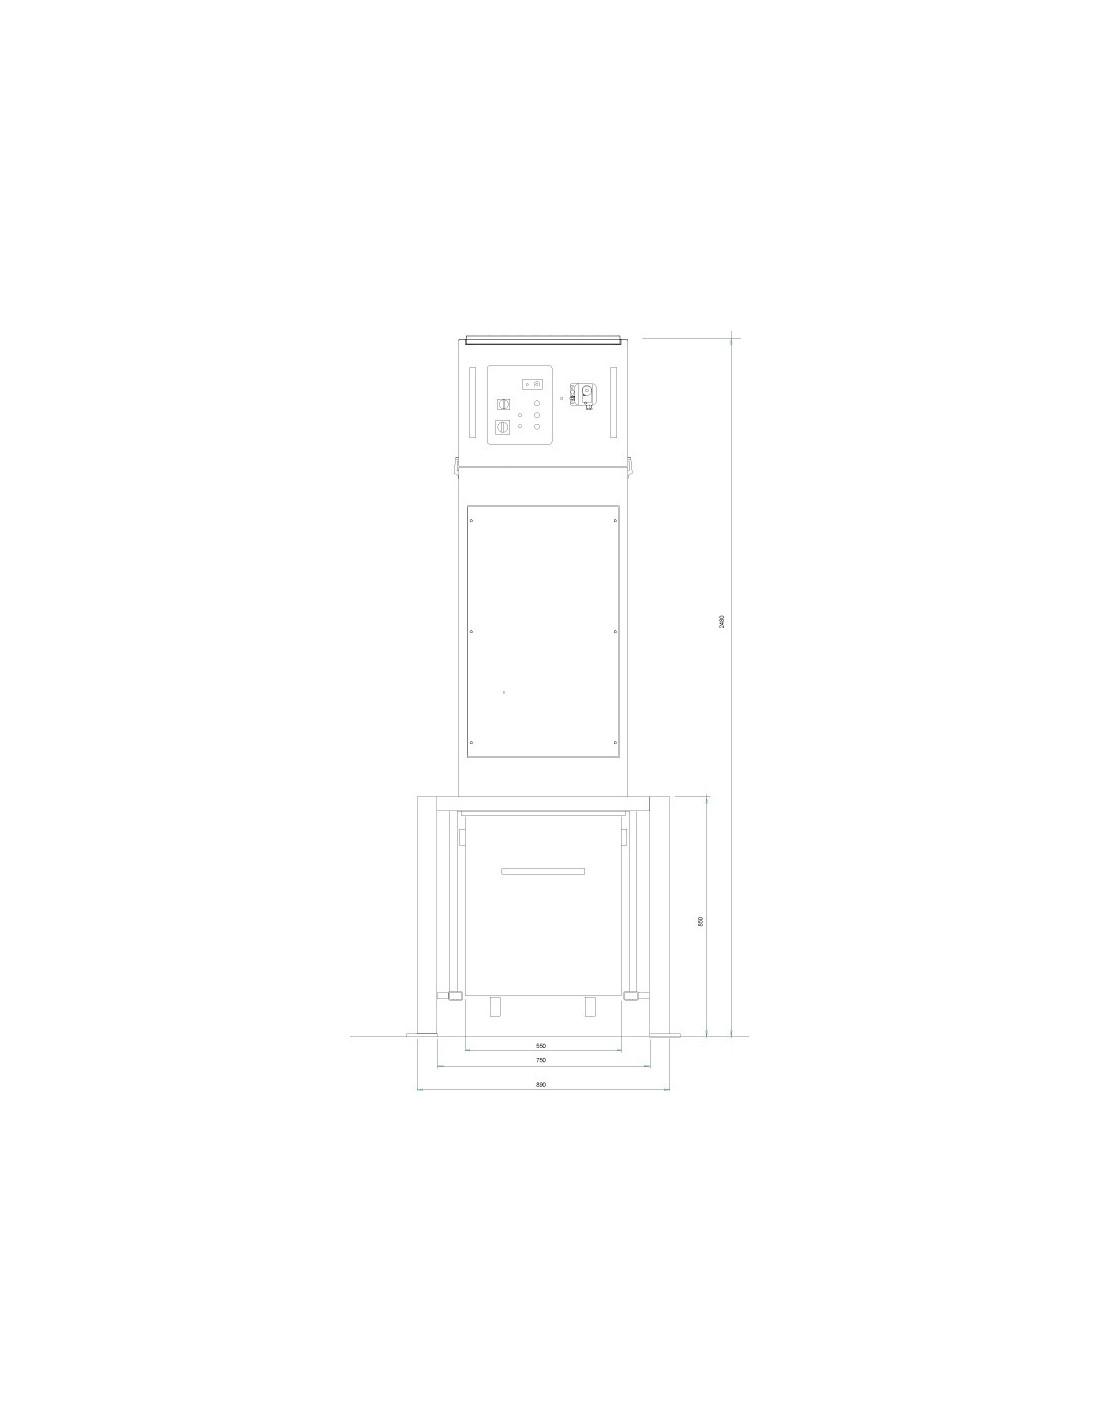 groupe d 39 aspiration copeaux poussi res bois holzprofi france. Black Bedroom Furniture Sets. Home Design Ideas